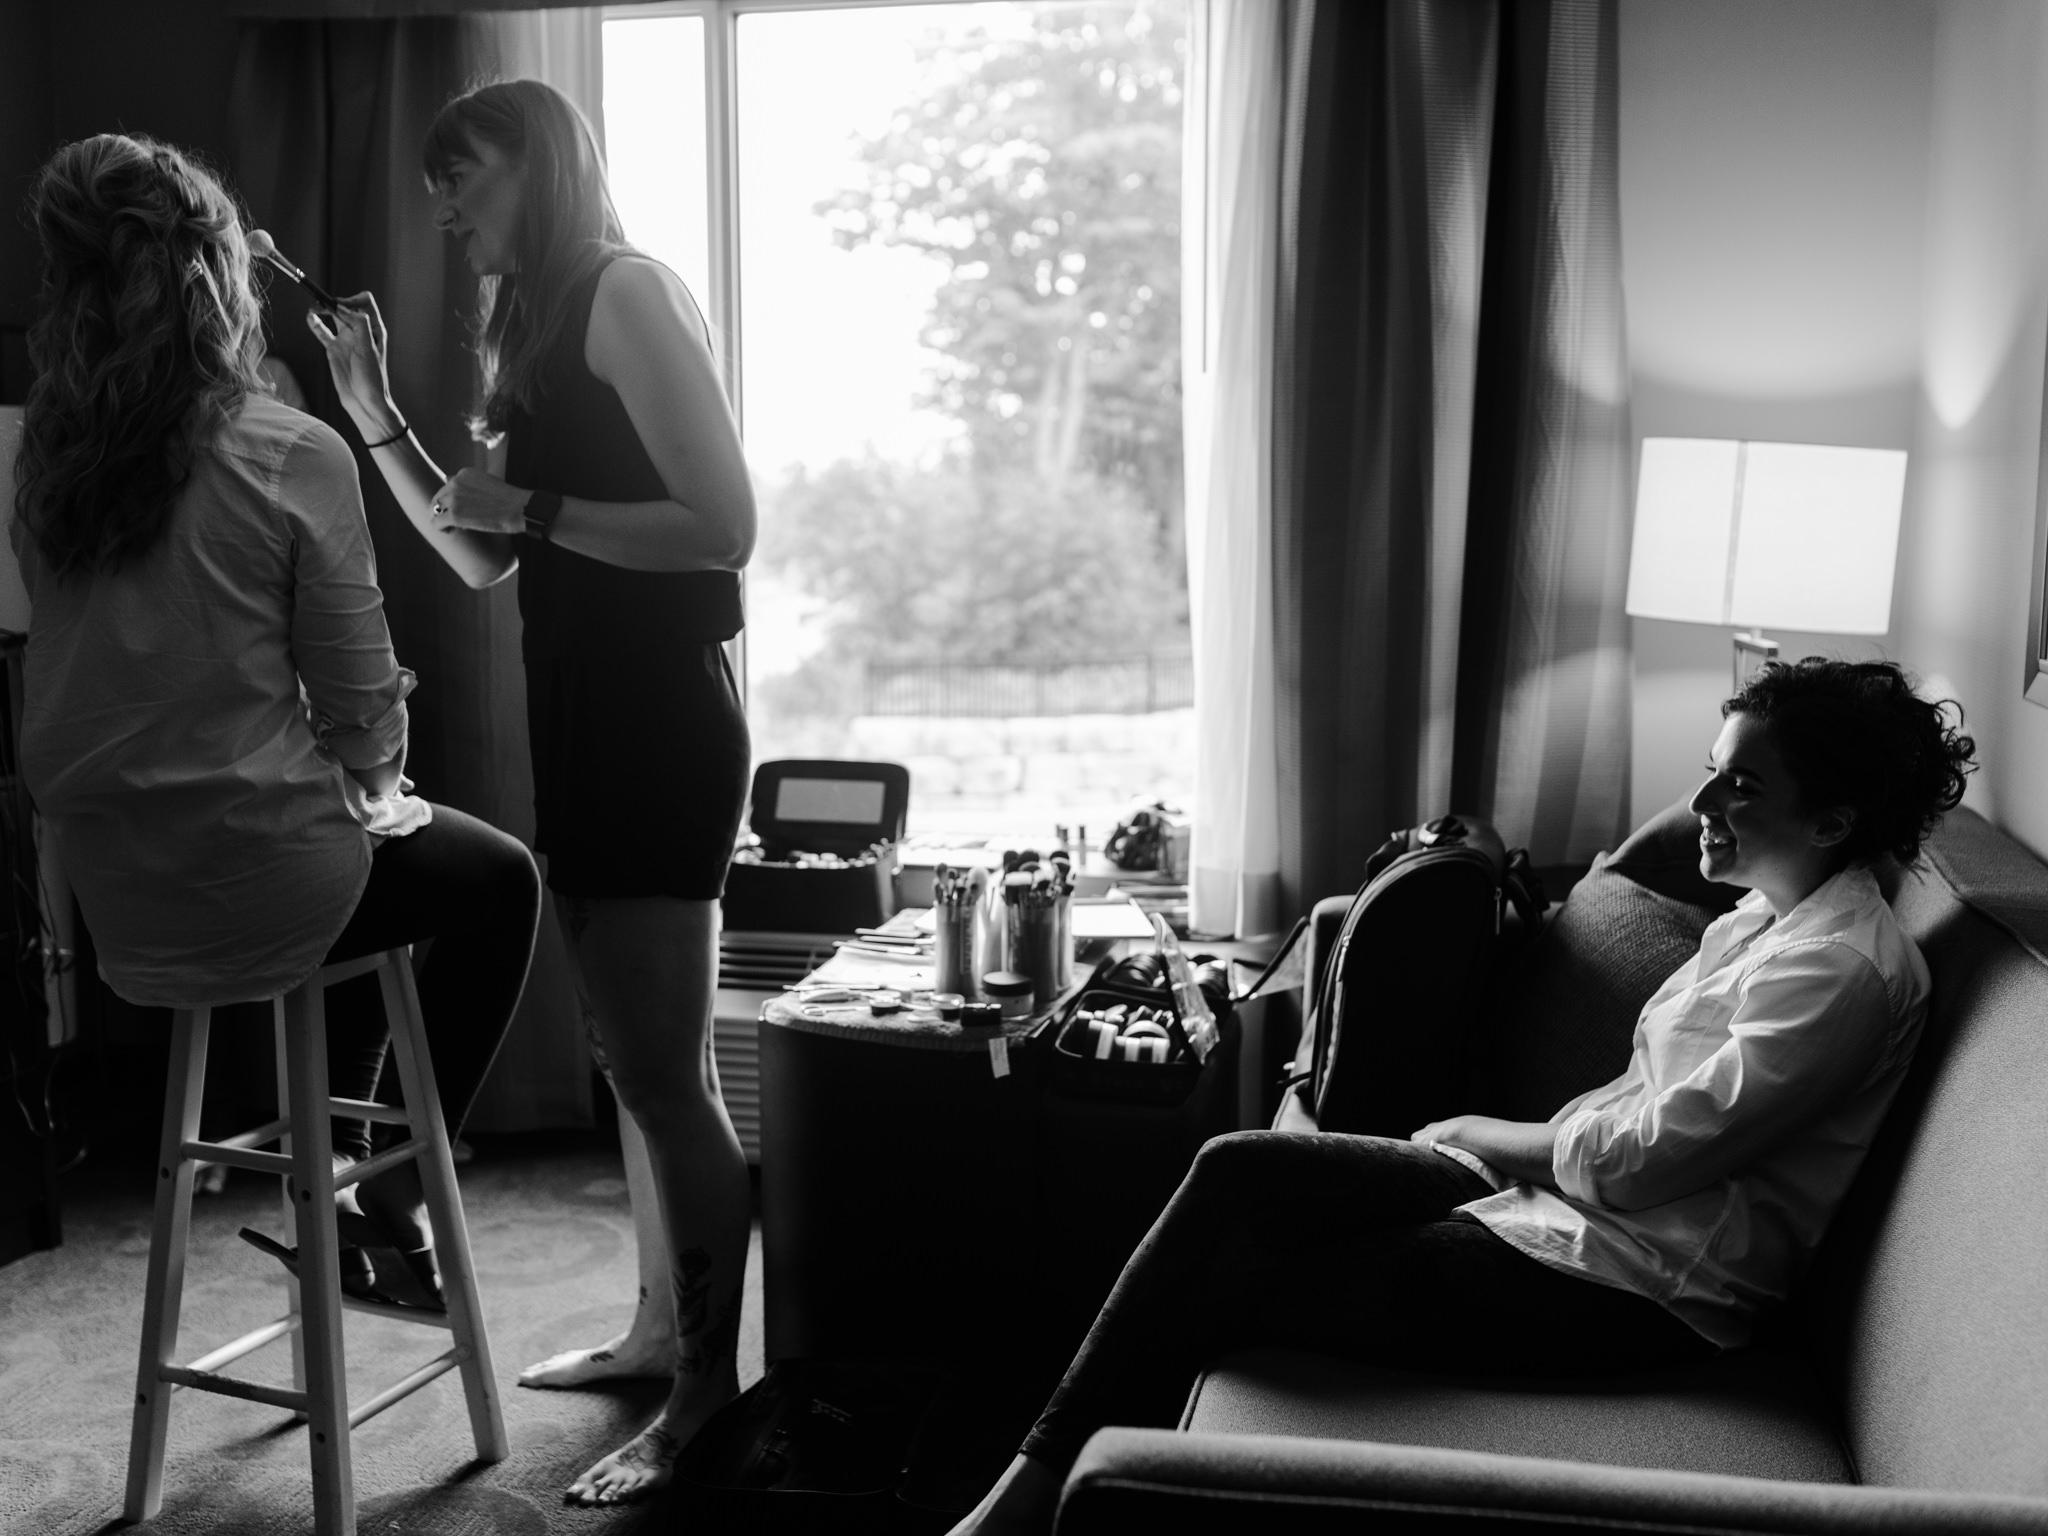 skyloft-wedding-toronto-wedding-photographer-2.jpg